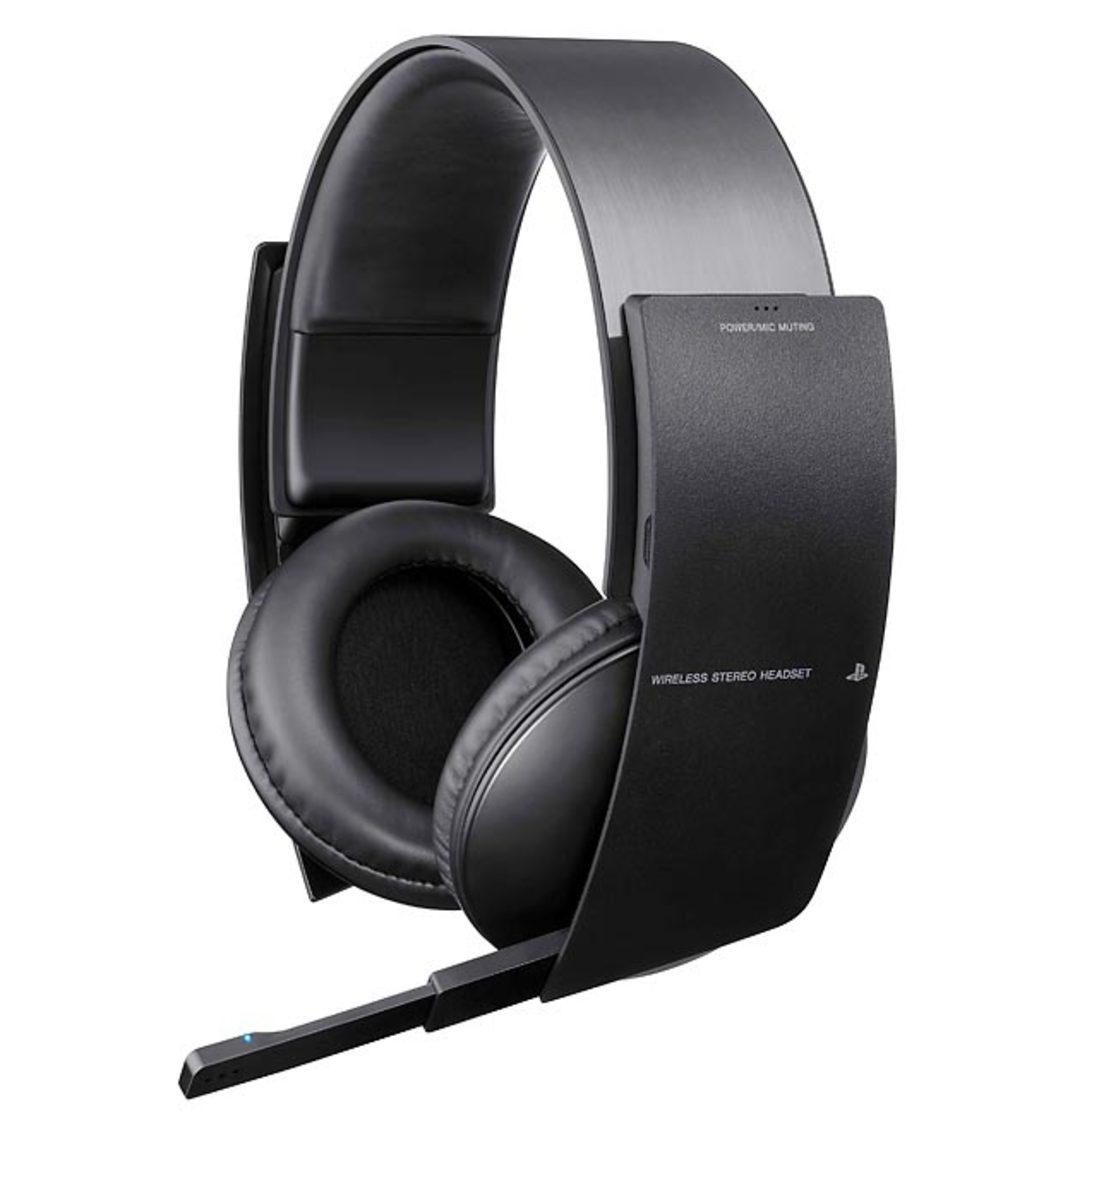 PS3 Wireless Headset